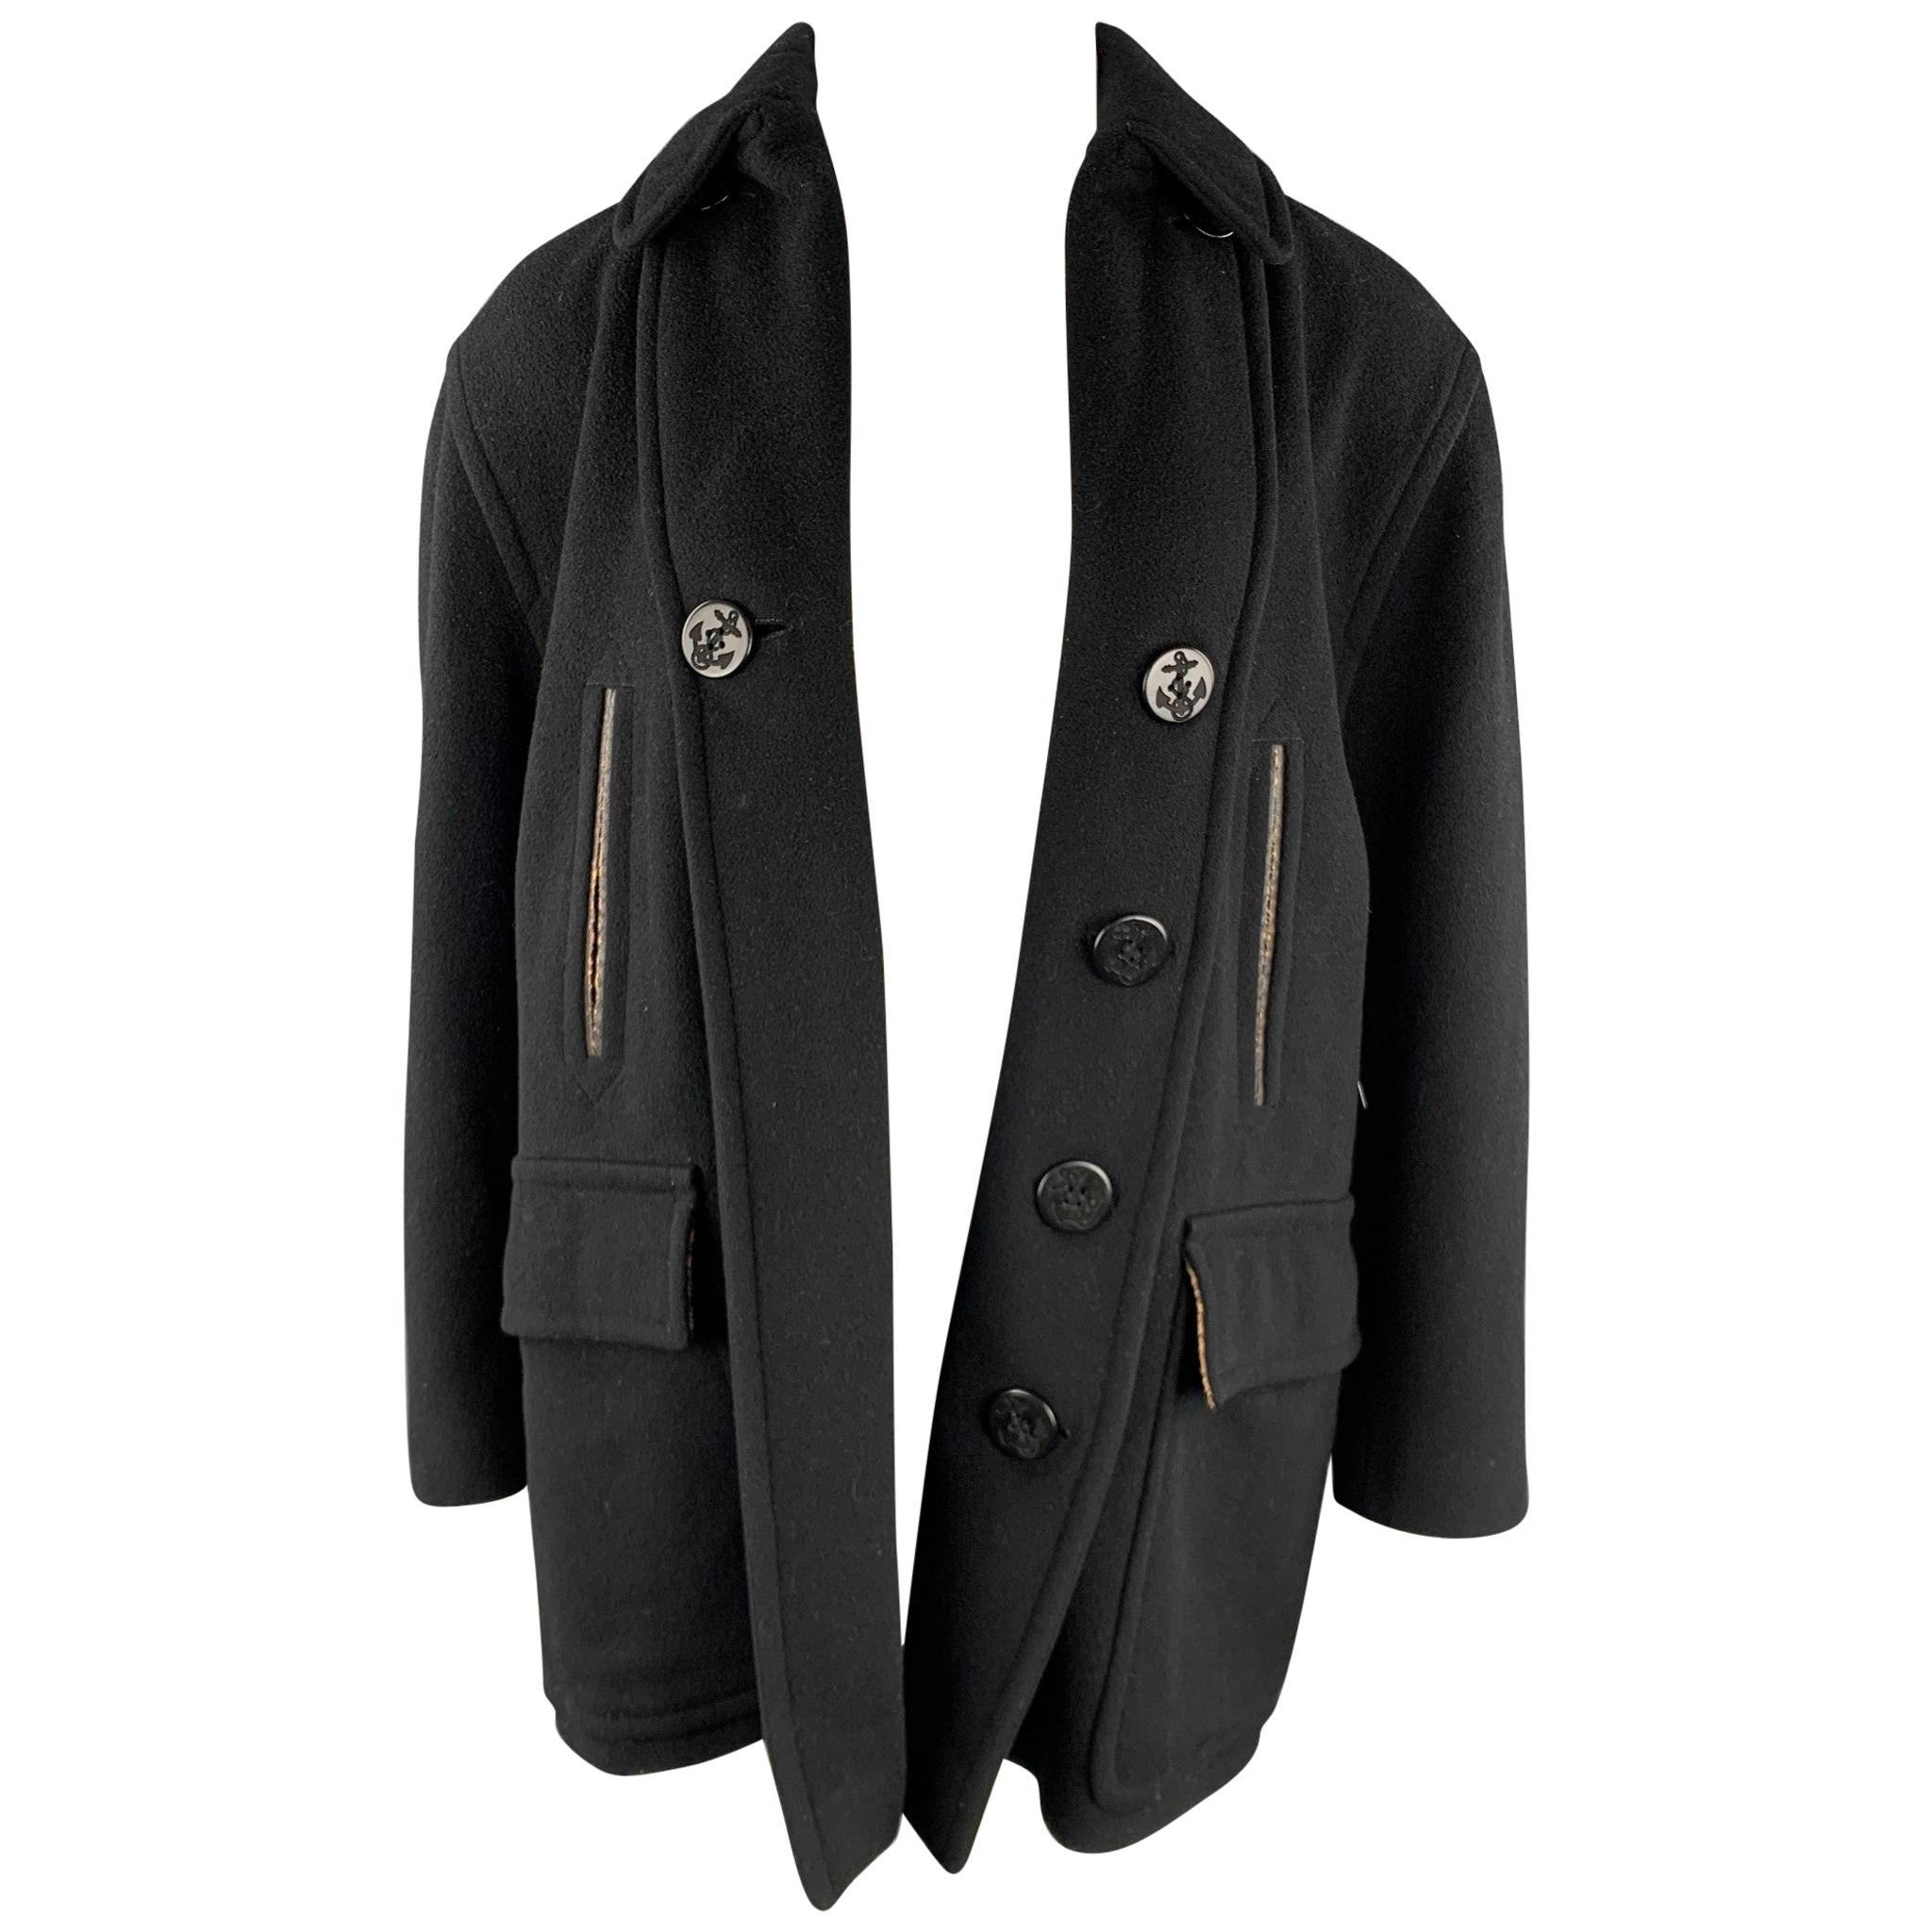 JEAN PAUL GAULTIER CLASSIQUE Size 10 Black Wool Blend Open Front Coat